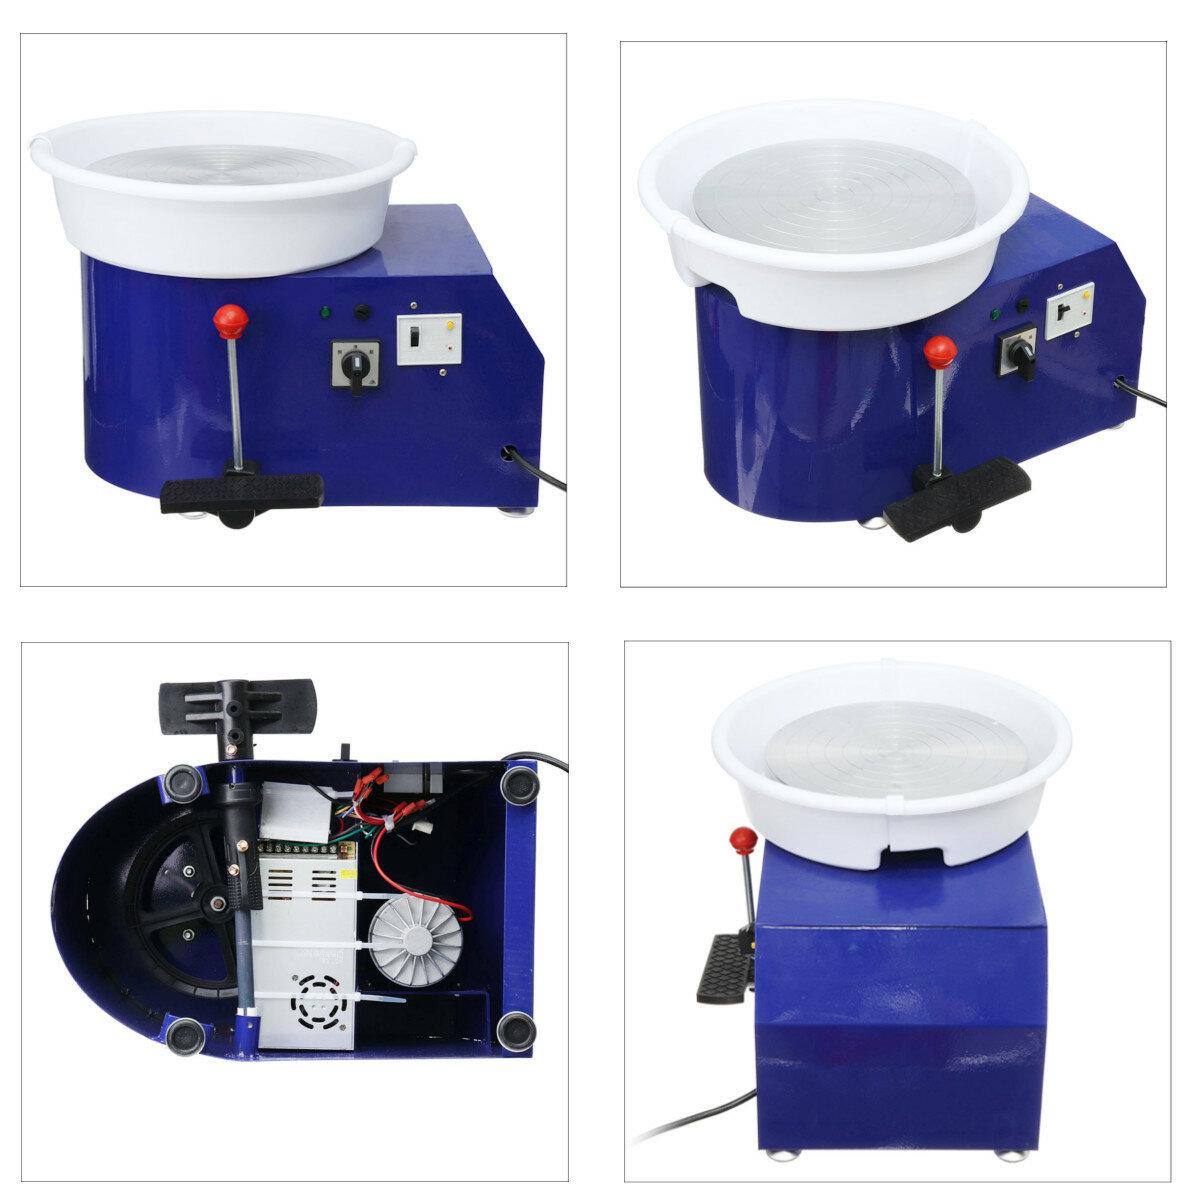 220V 550W Electric Pottery Wheel Ceramic Machine 300mm Ceramic Clay Potter Kit